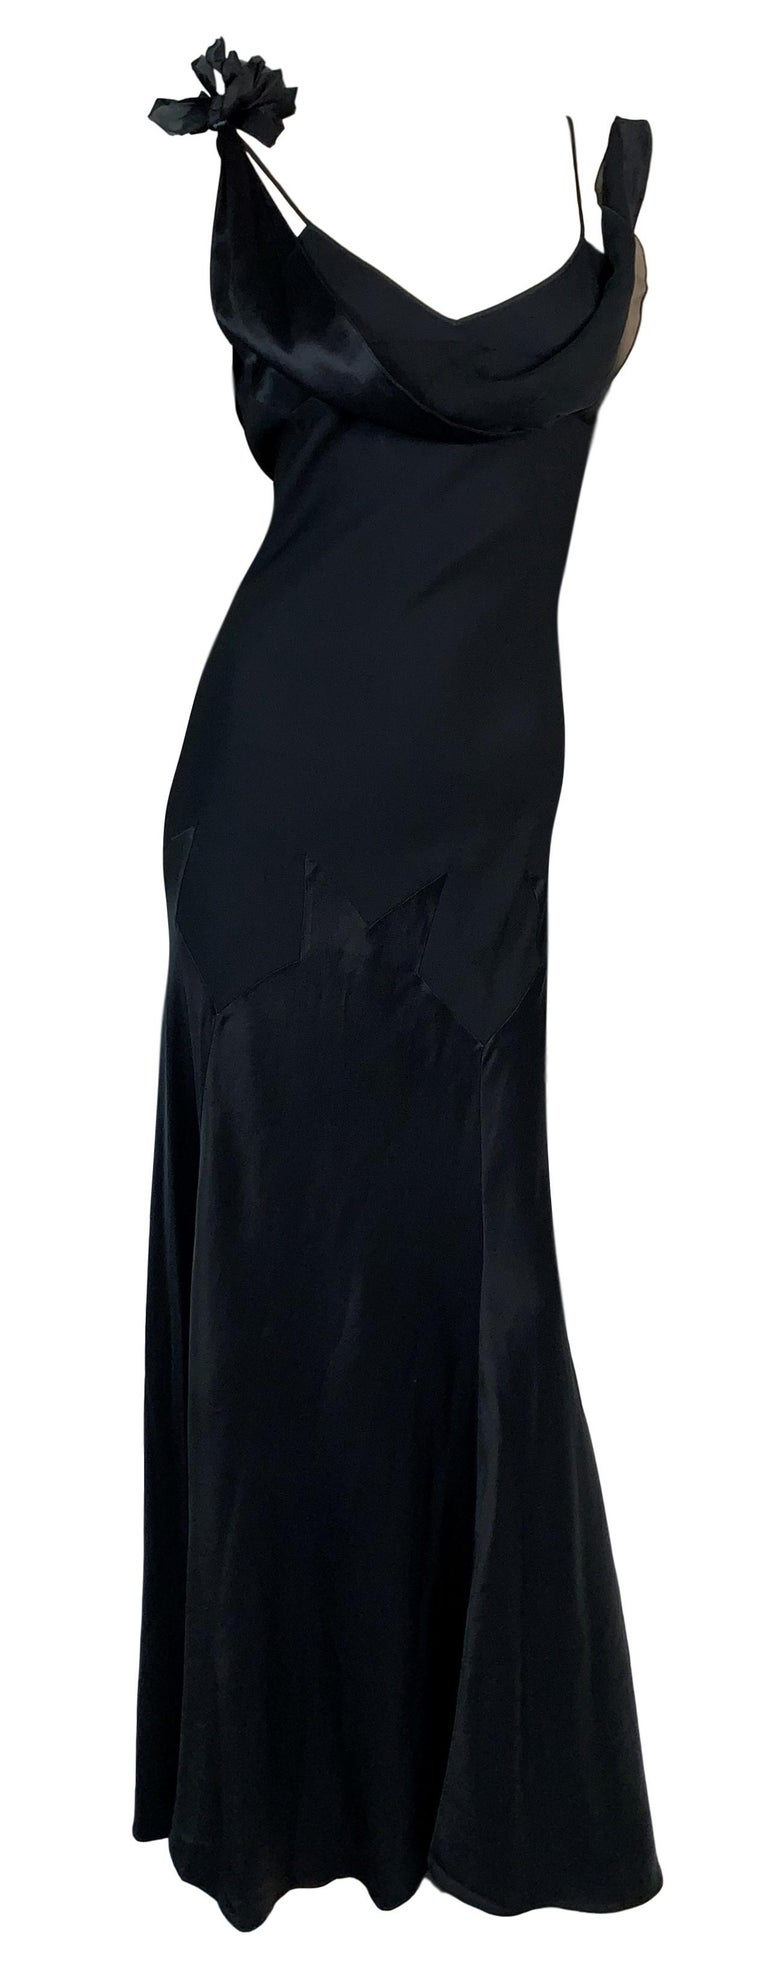 F/W 1994 John Galliano Runway Black Off Shoulder Flower Gown Dress In Good Condition For Sale In Yukon, OK